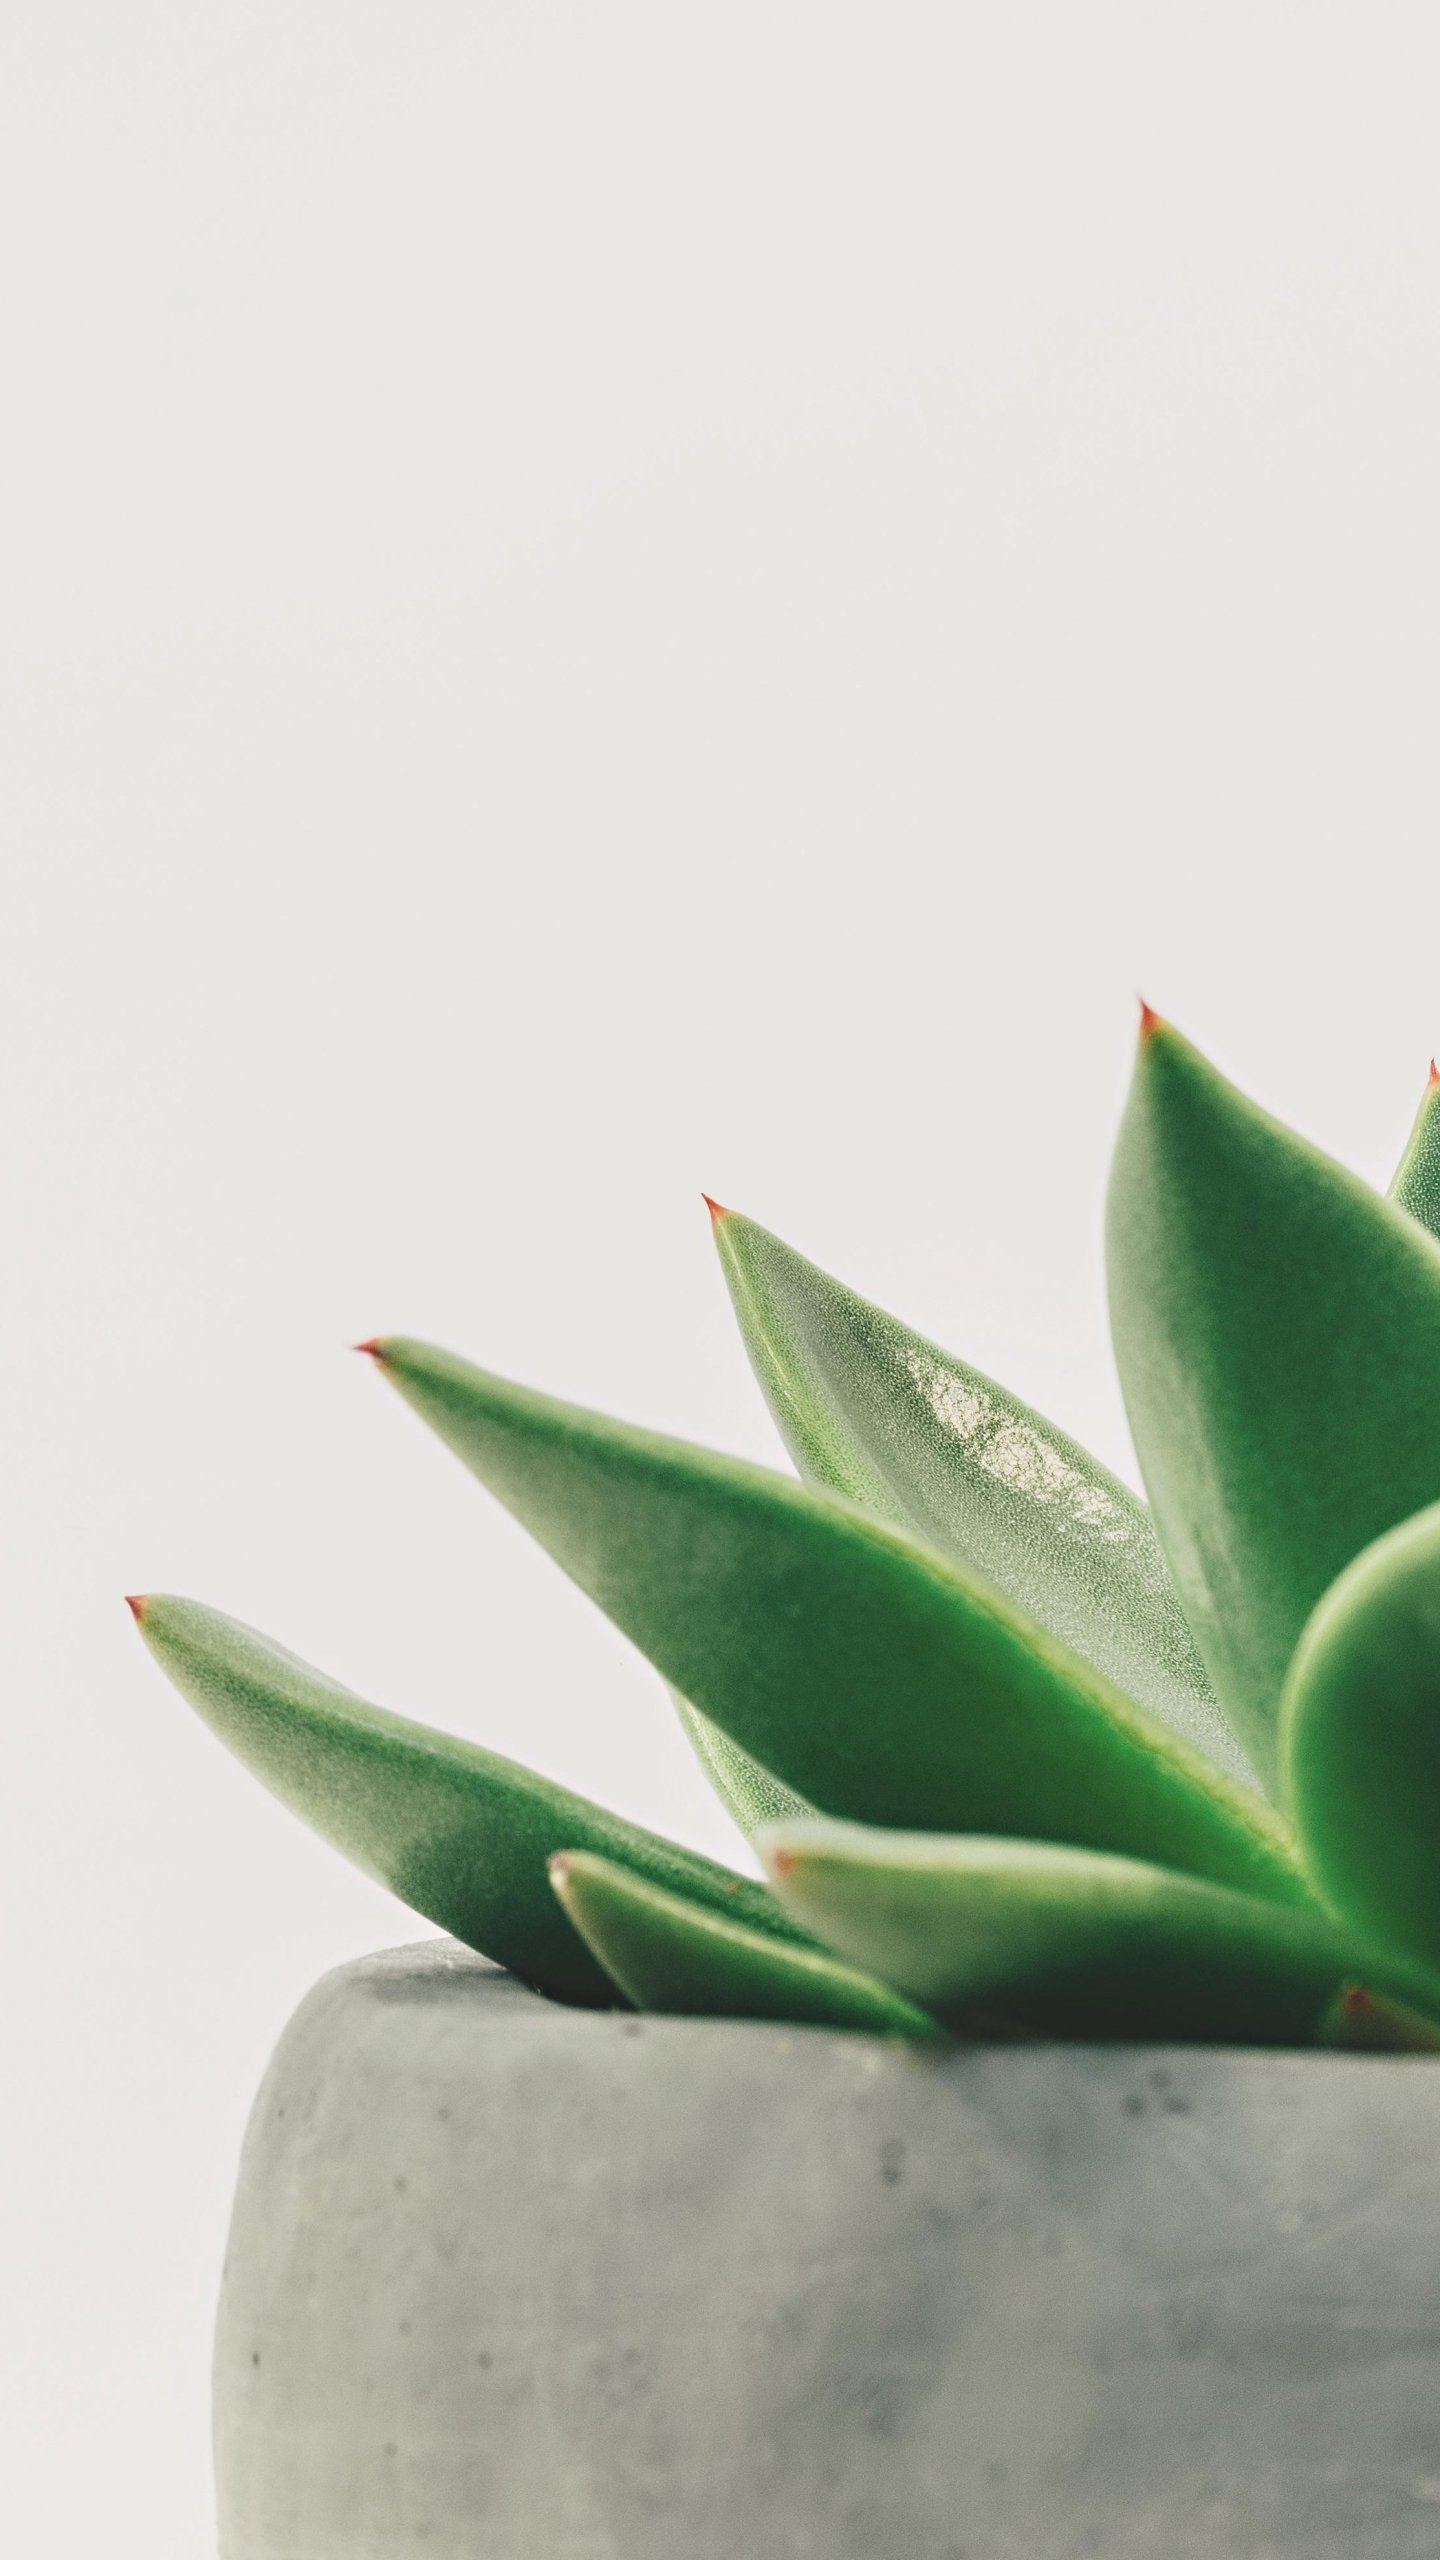 Minimalist Succulent Wallpaper Iphone Android Desktop